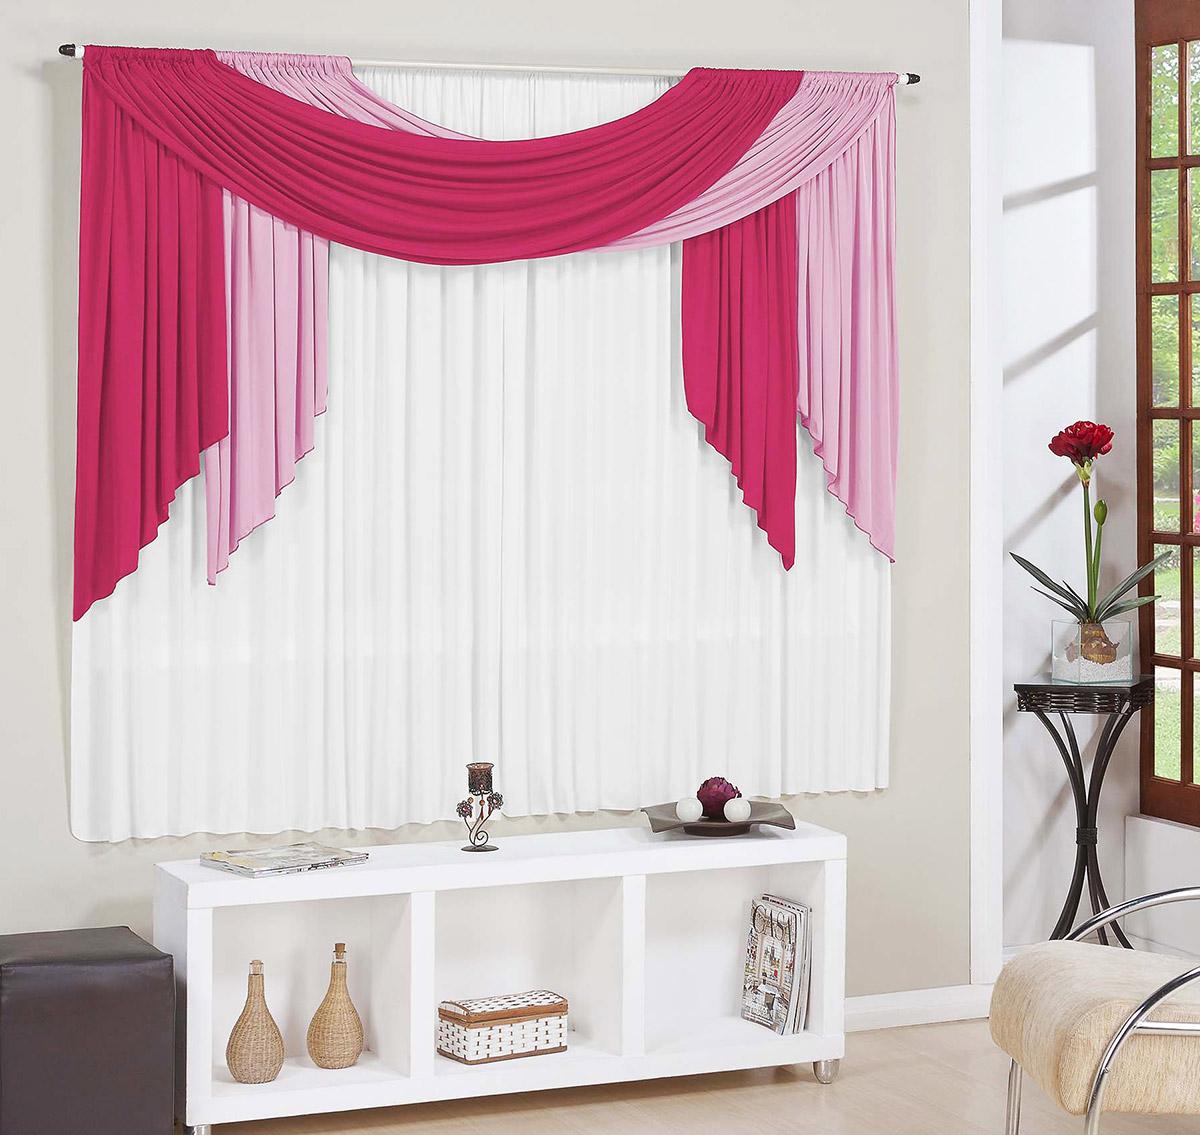 Cortina para sala e quarto pink e rosa e branco 3 metros for Cortinas bonitas para sala